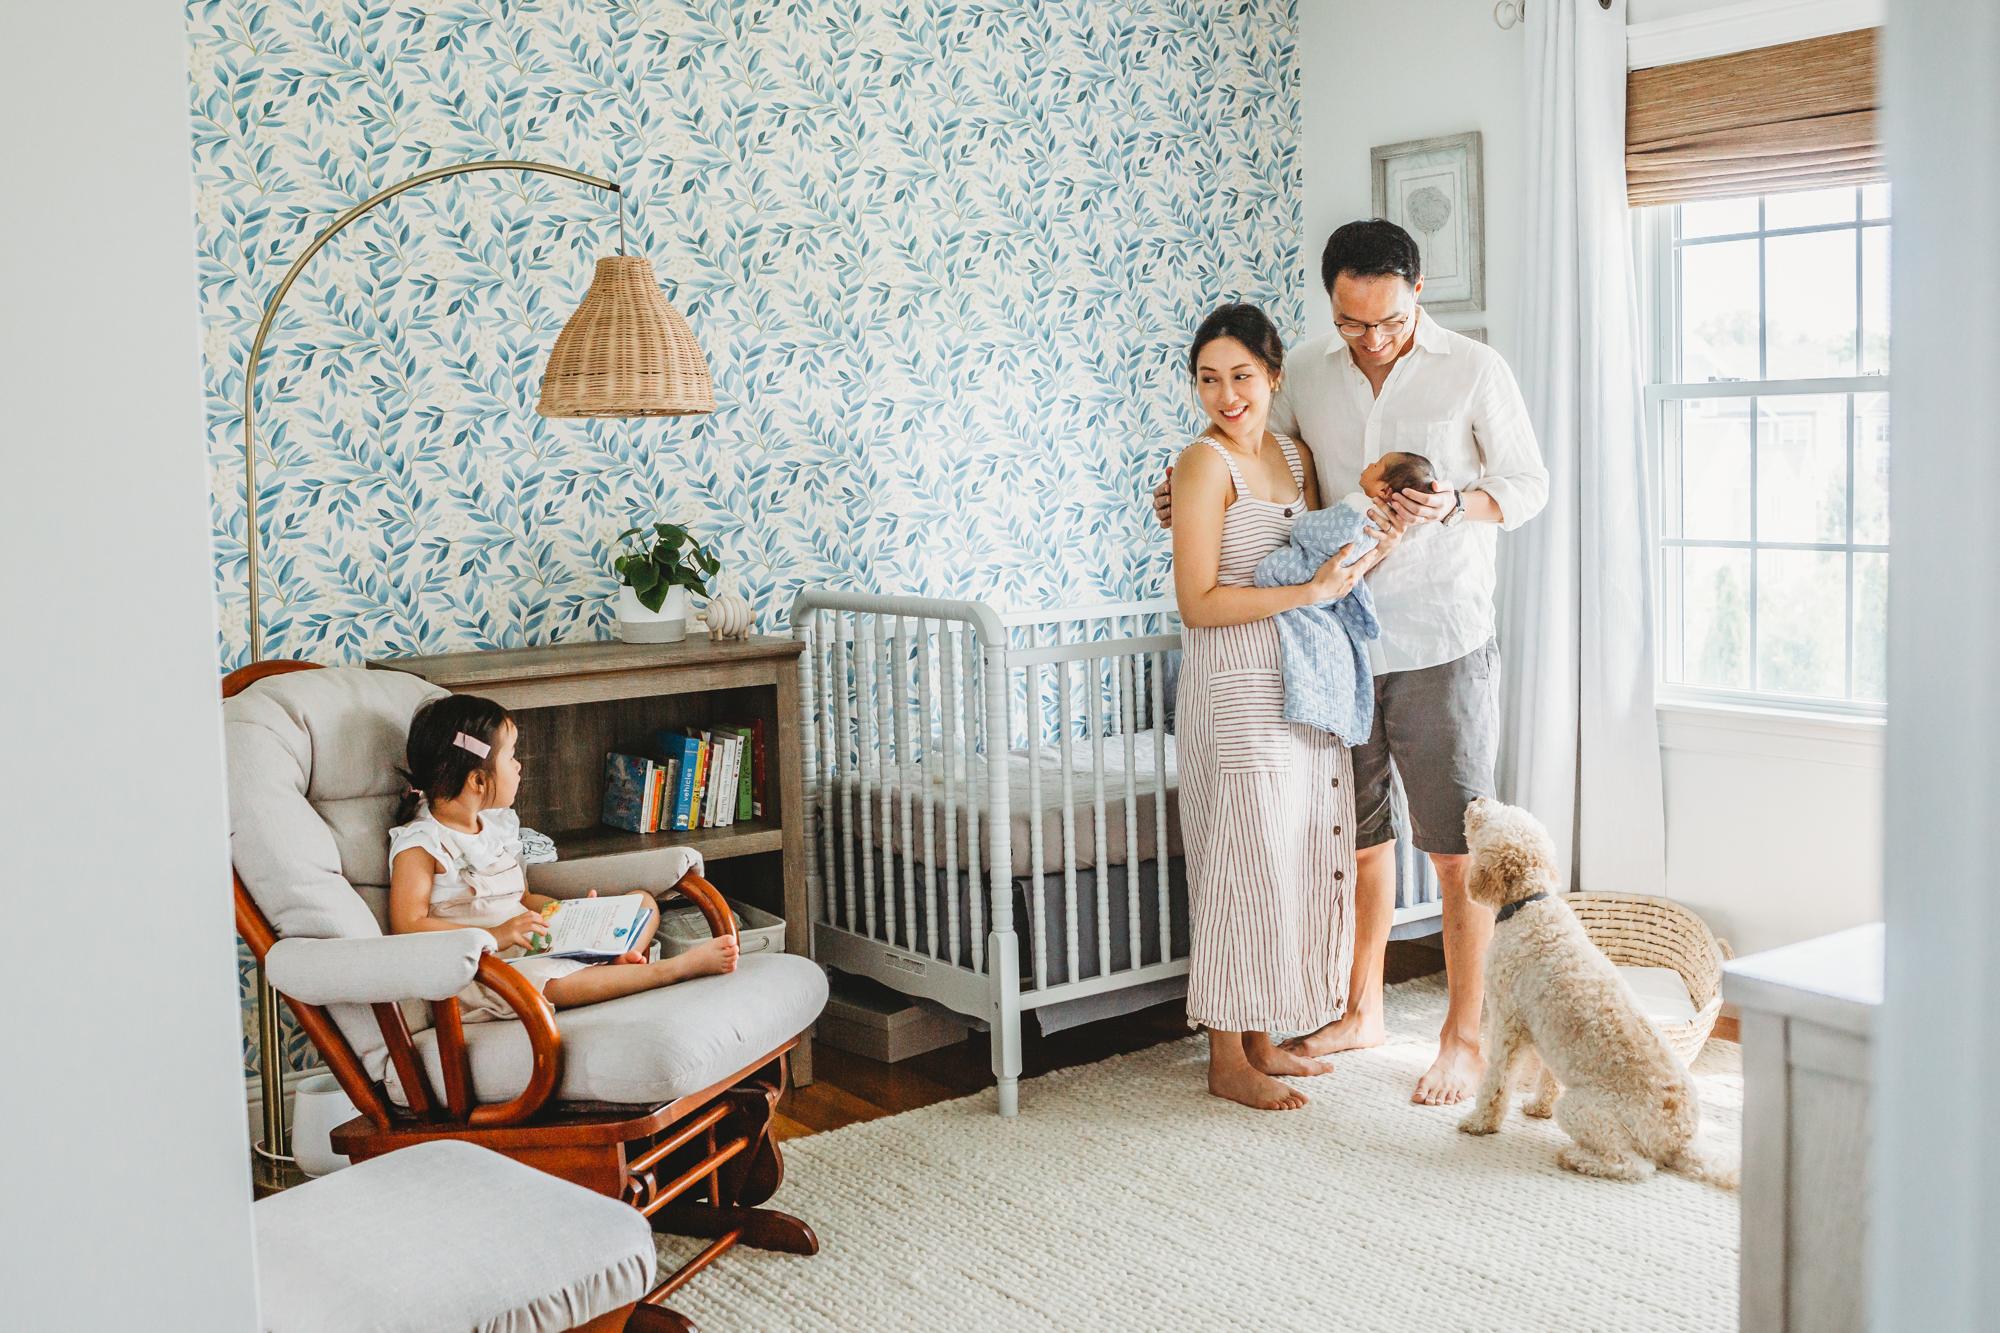 Boston-Newborn-Photographer-Framingham-Peaceful-In-Home-Session-11.jpg